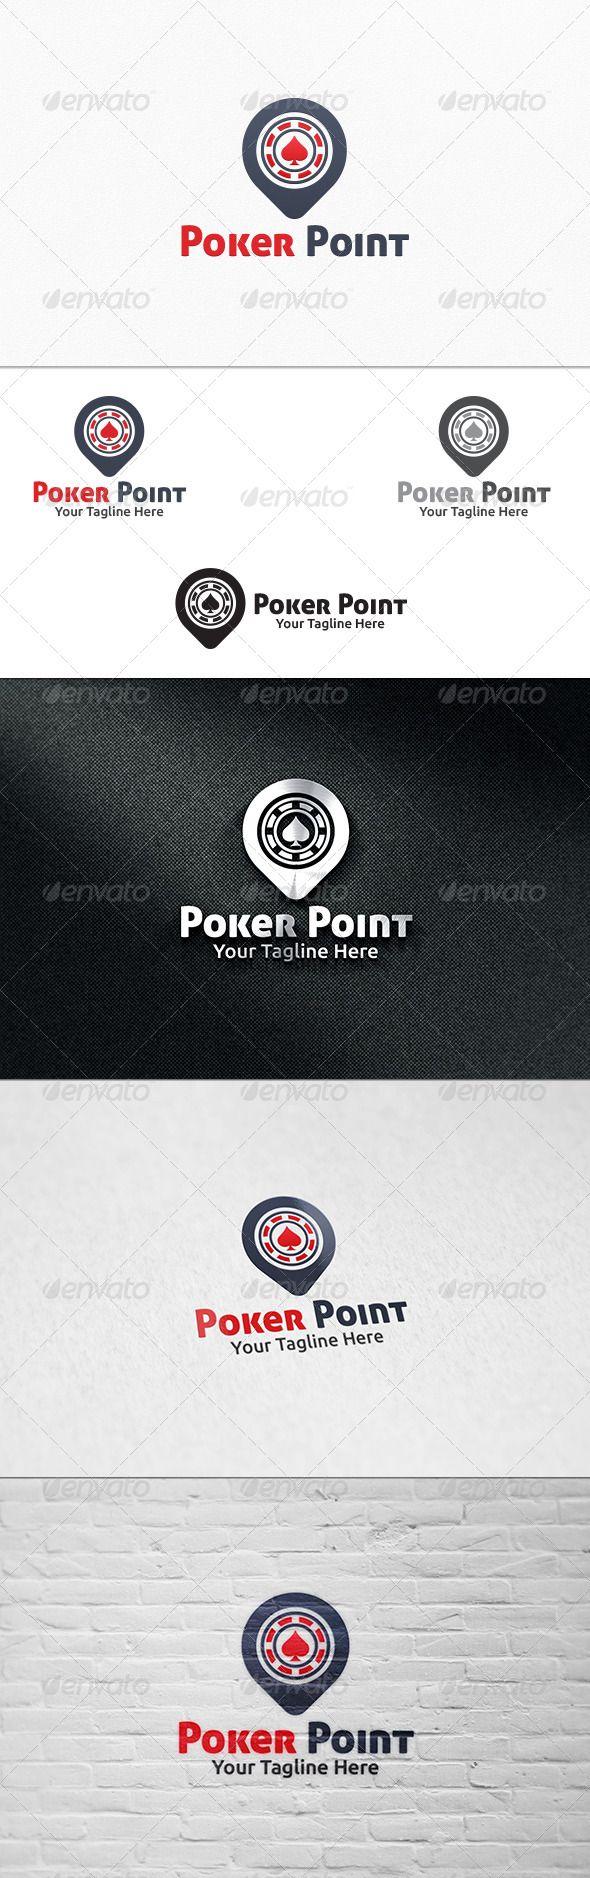 casino poker online royal secrets